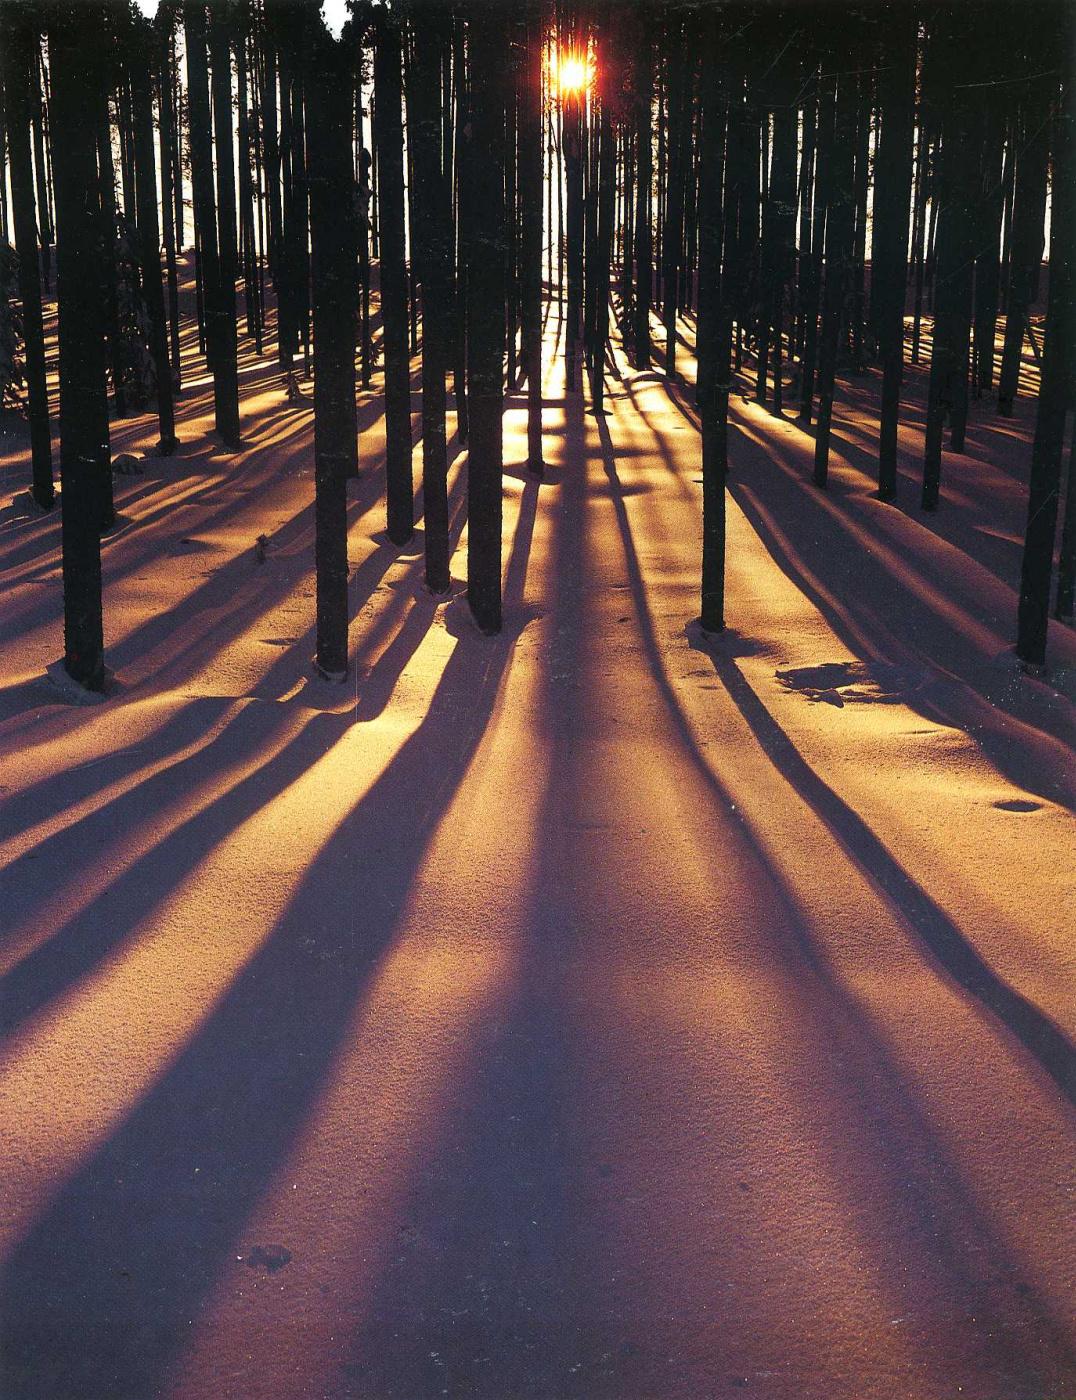 David Munich. Sunlight through the trees